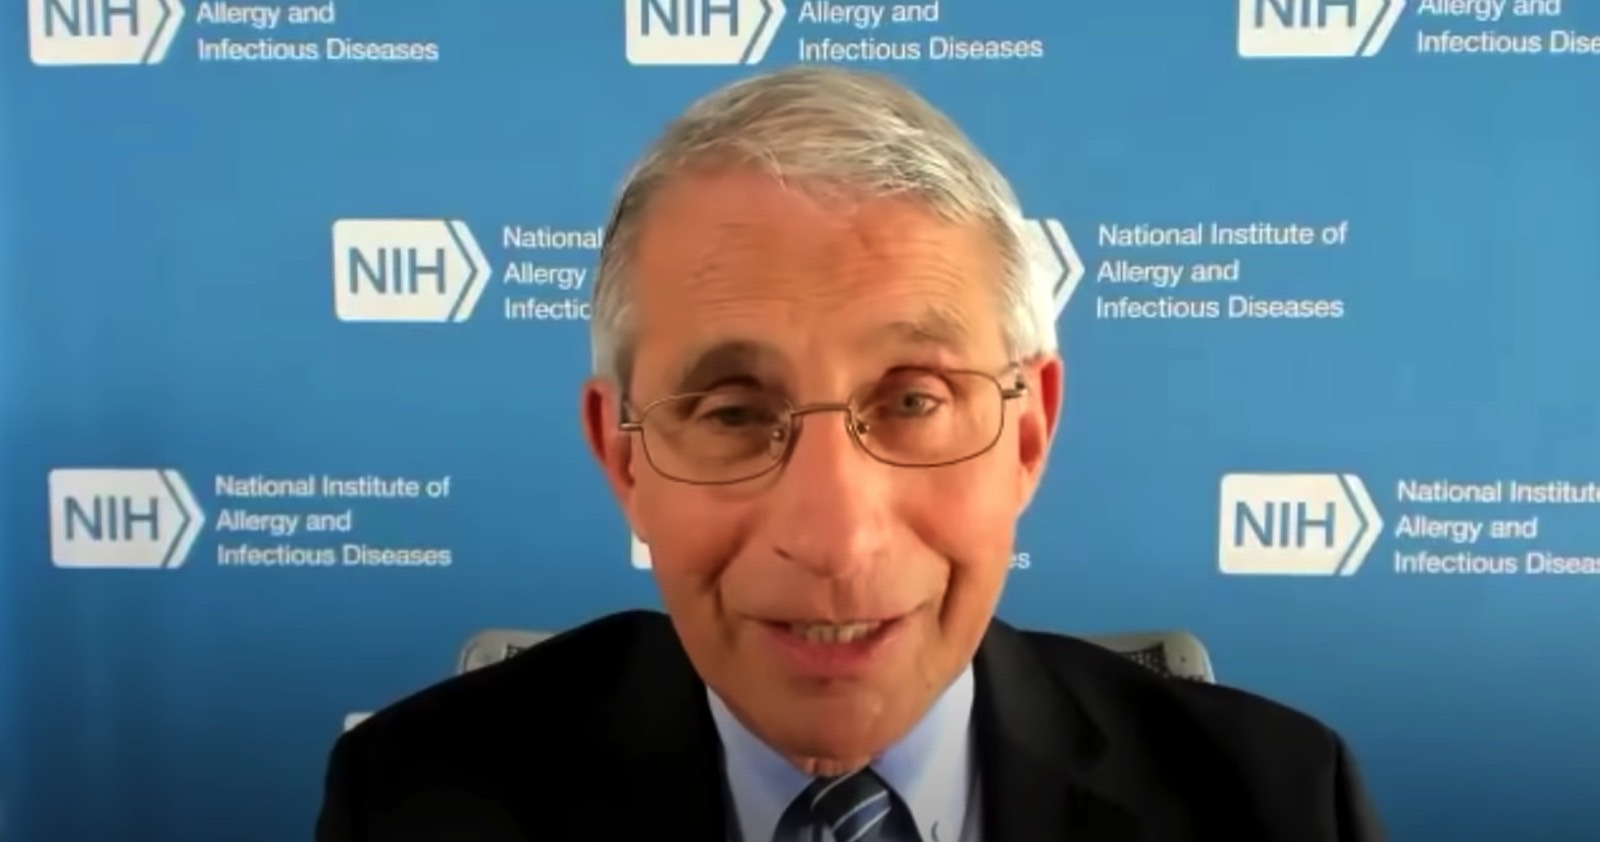 Dr. Fauci slams Fox News for 'outlandish' coronavirus coverage